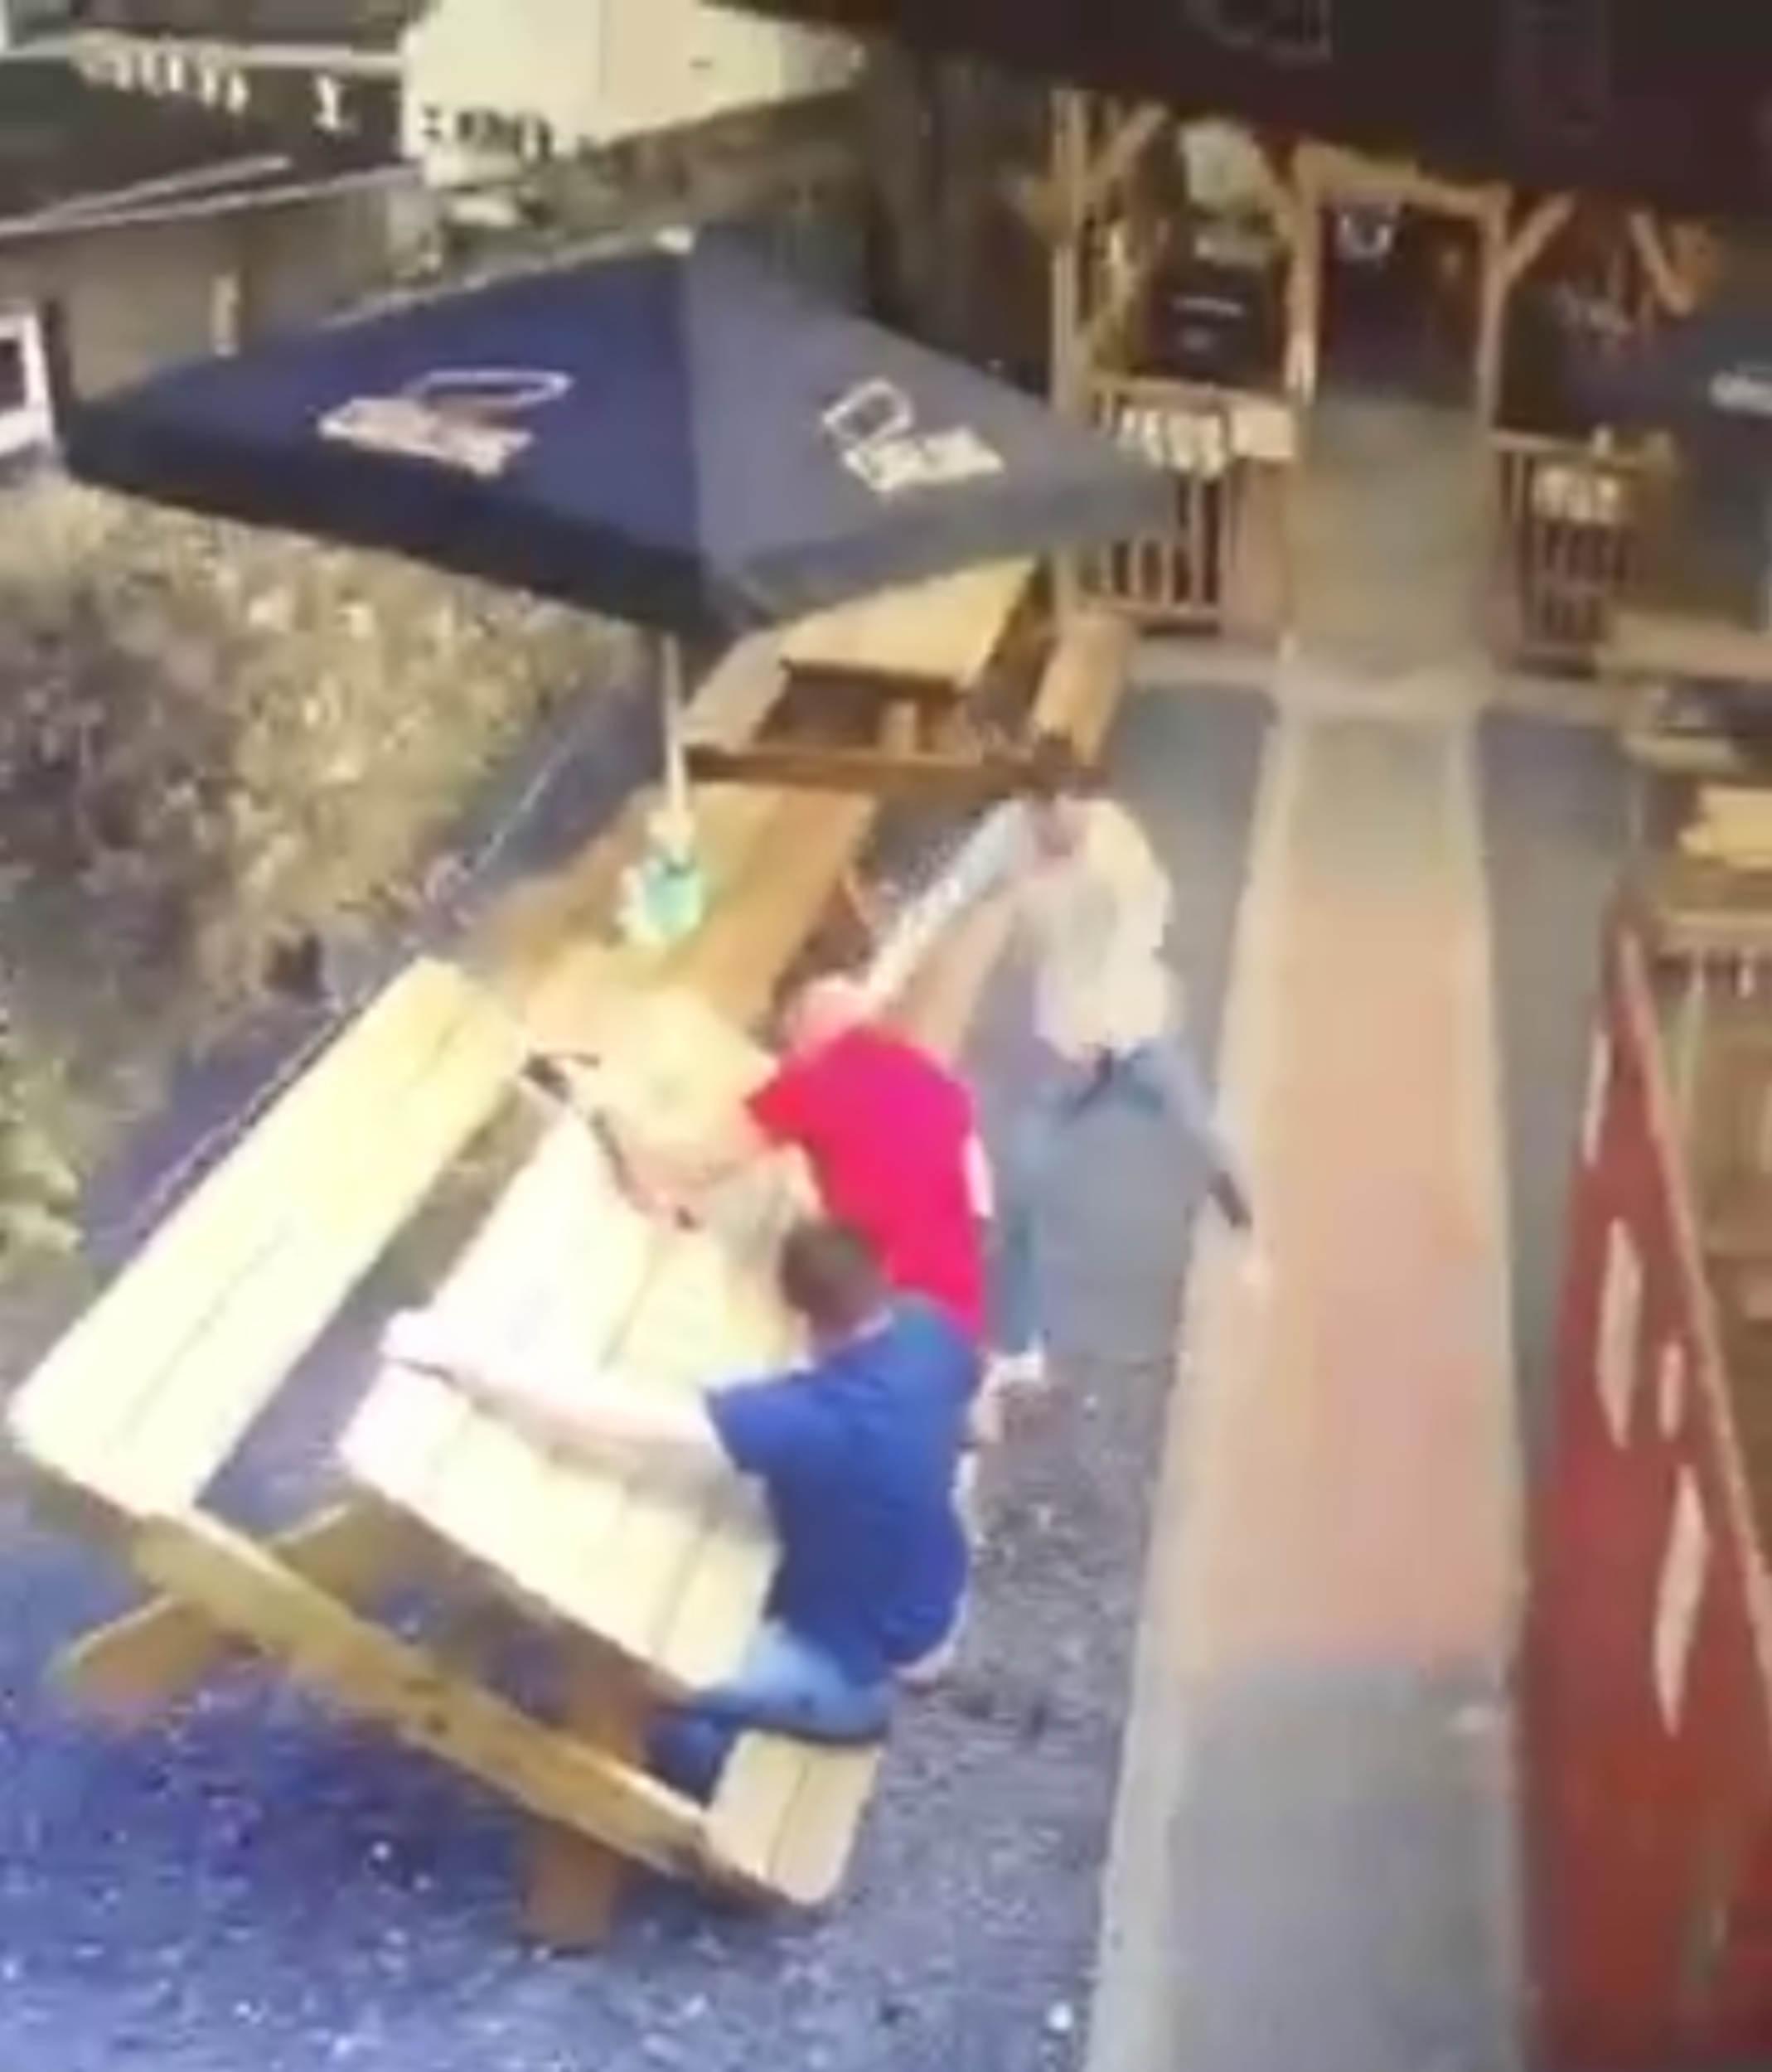 Irish pub table tilting - UK and World News